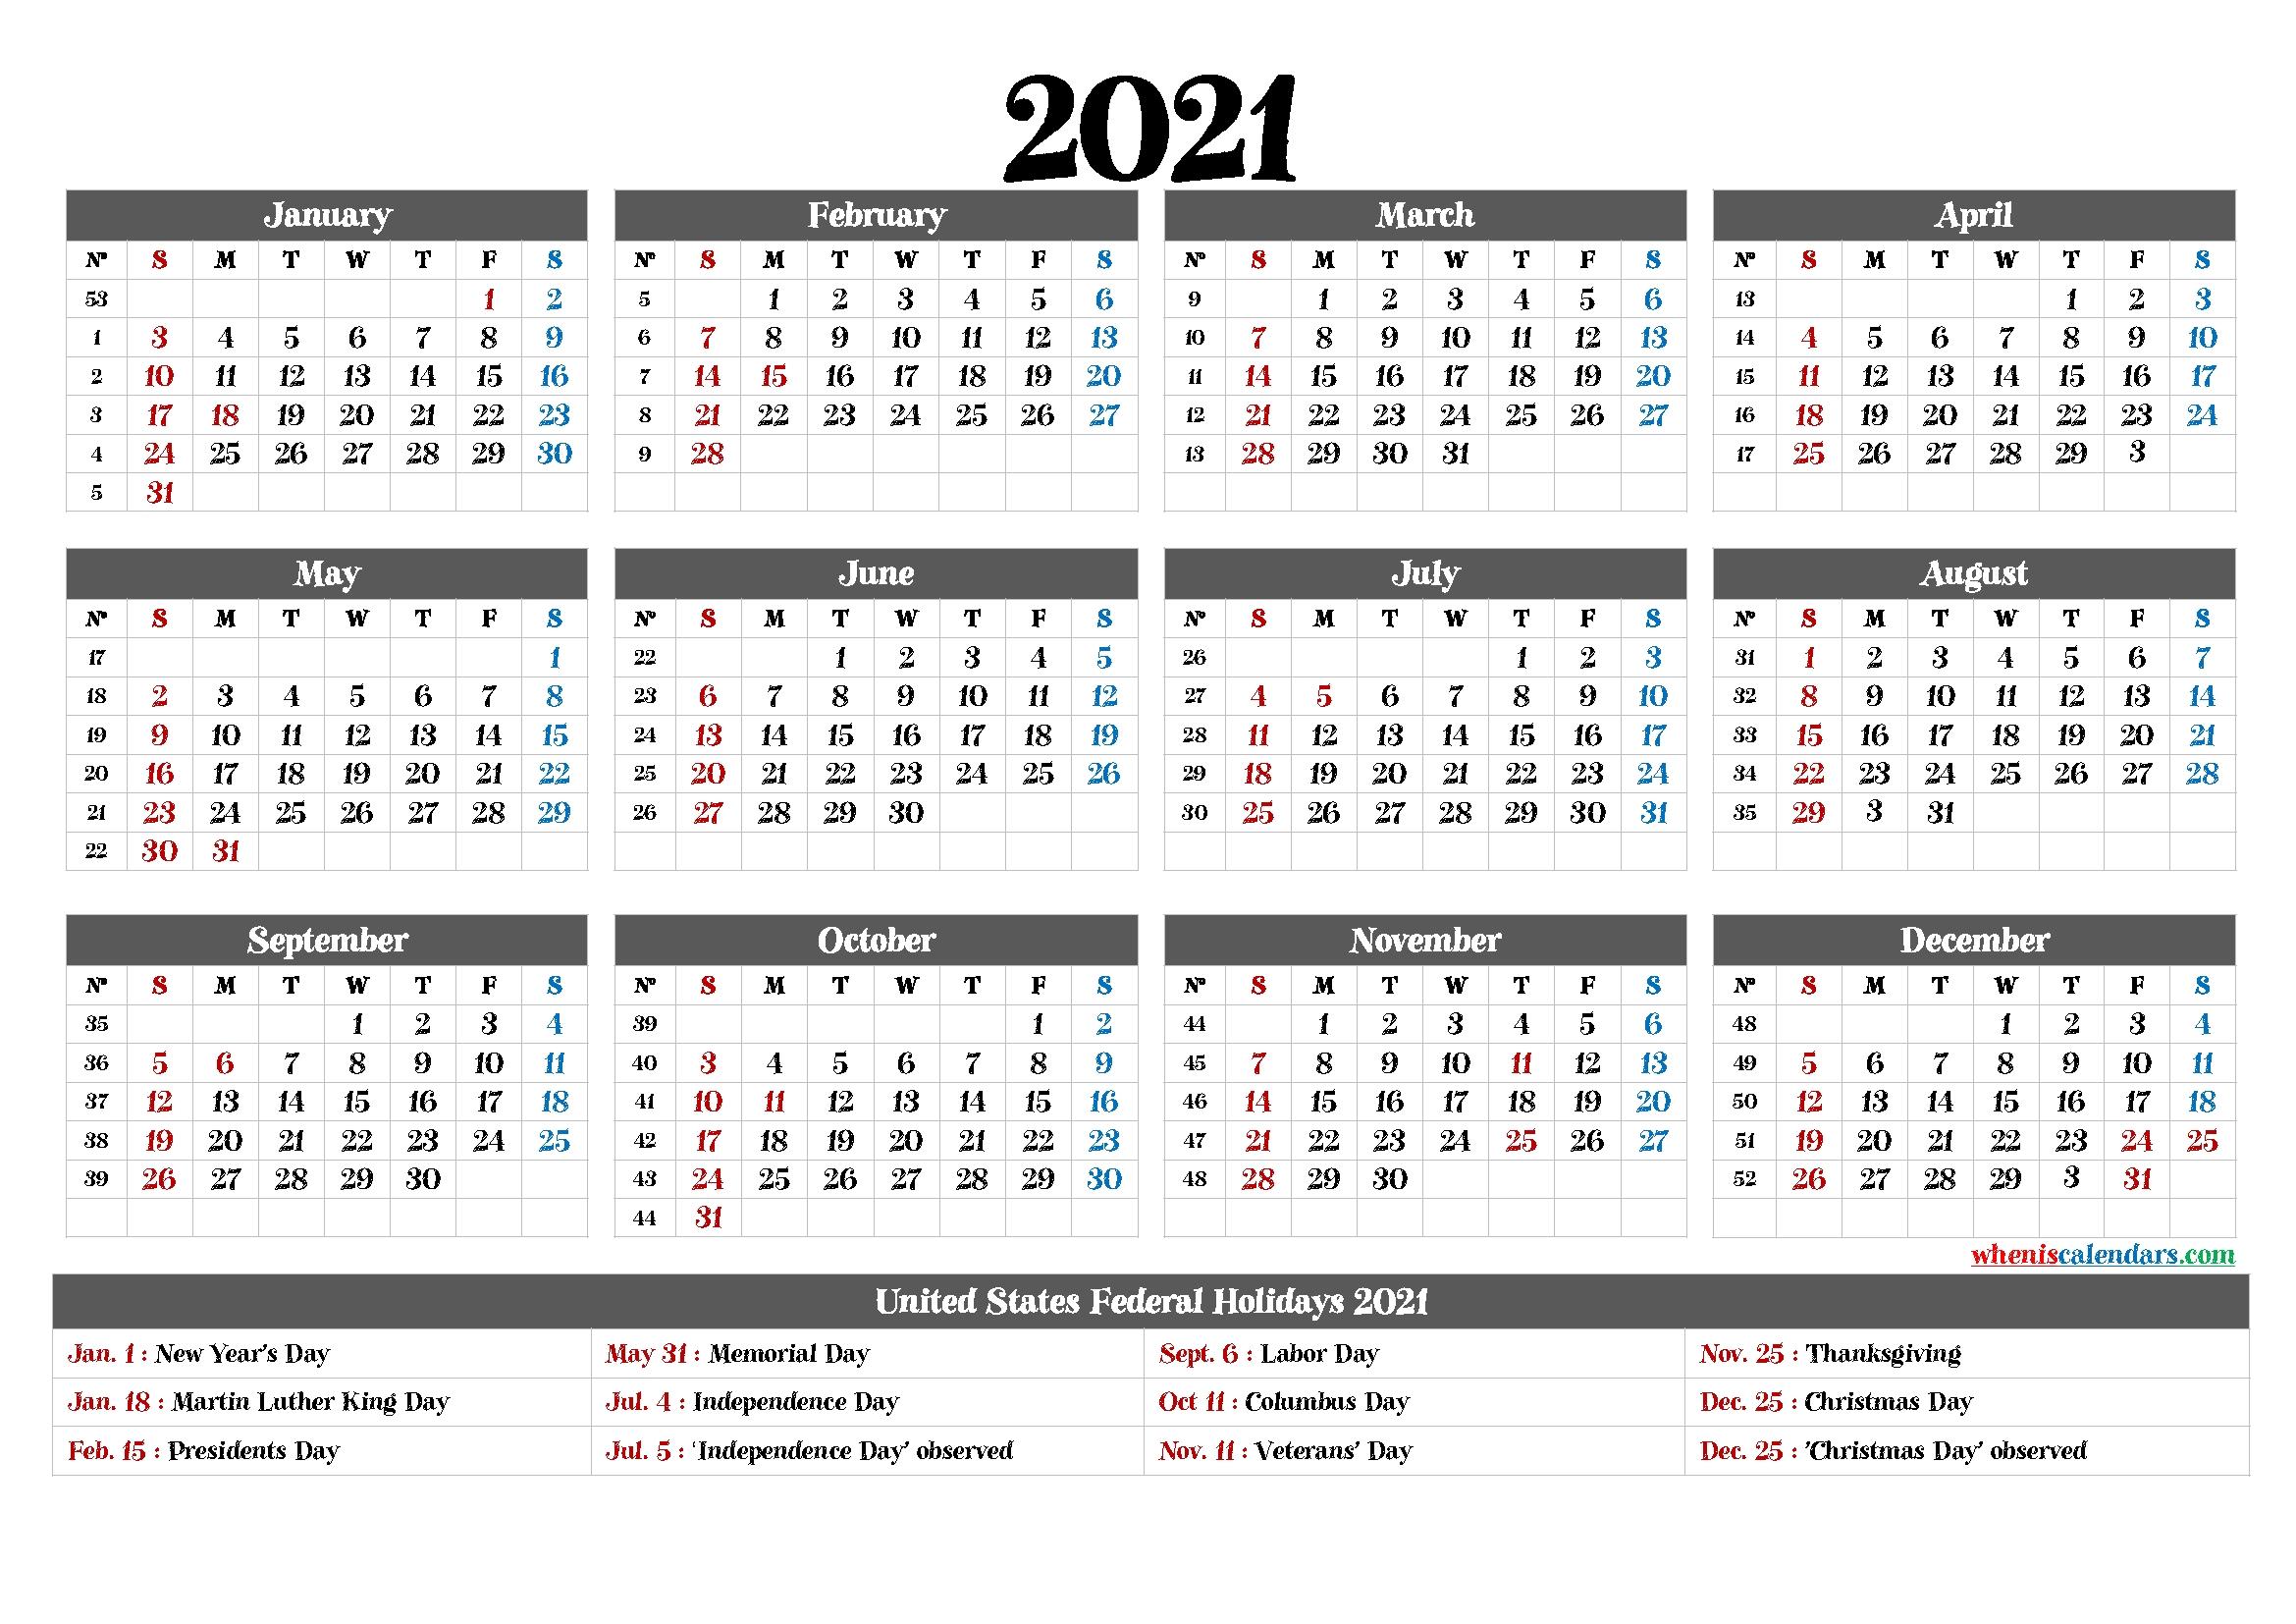 Printable 2021 Calendar With Holidays 12 Templates - Free